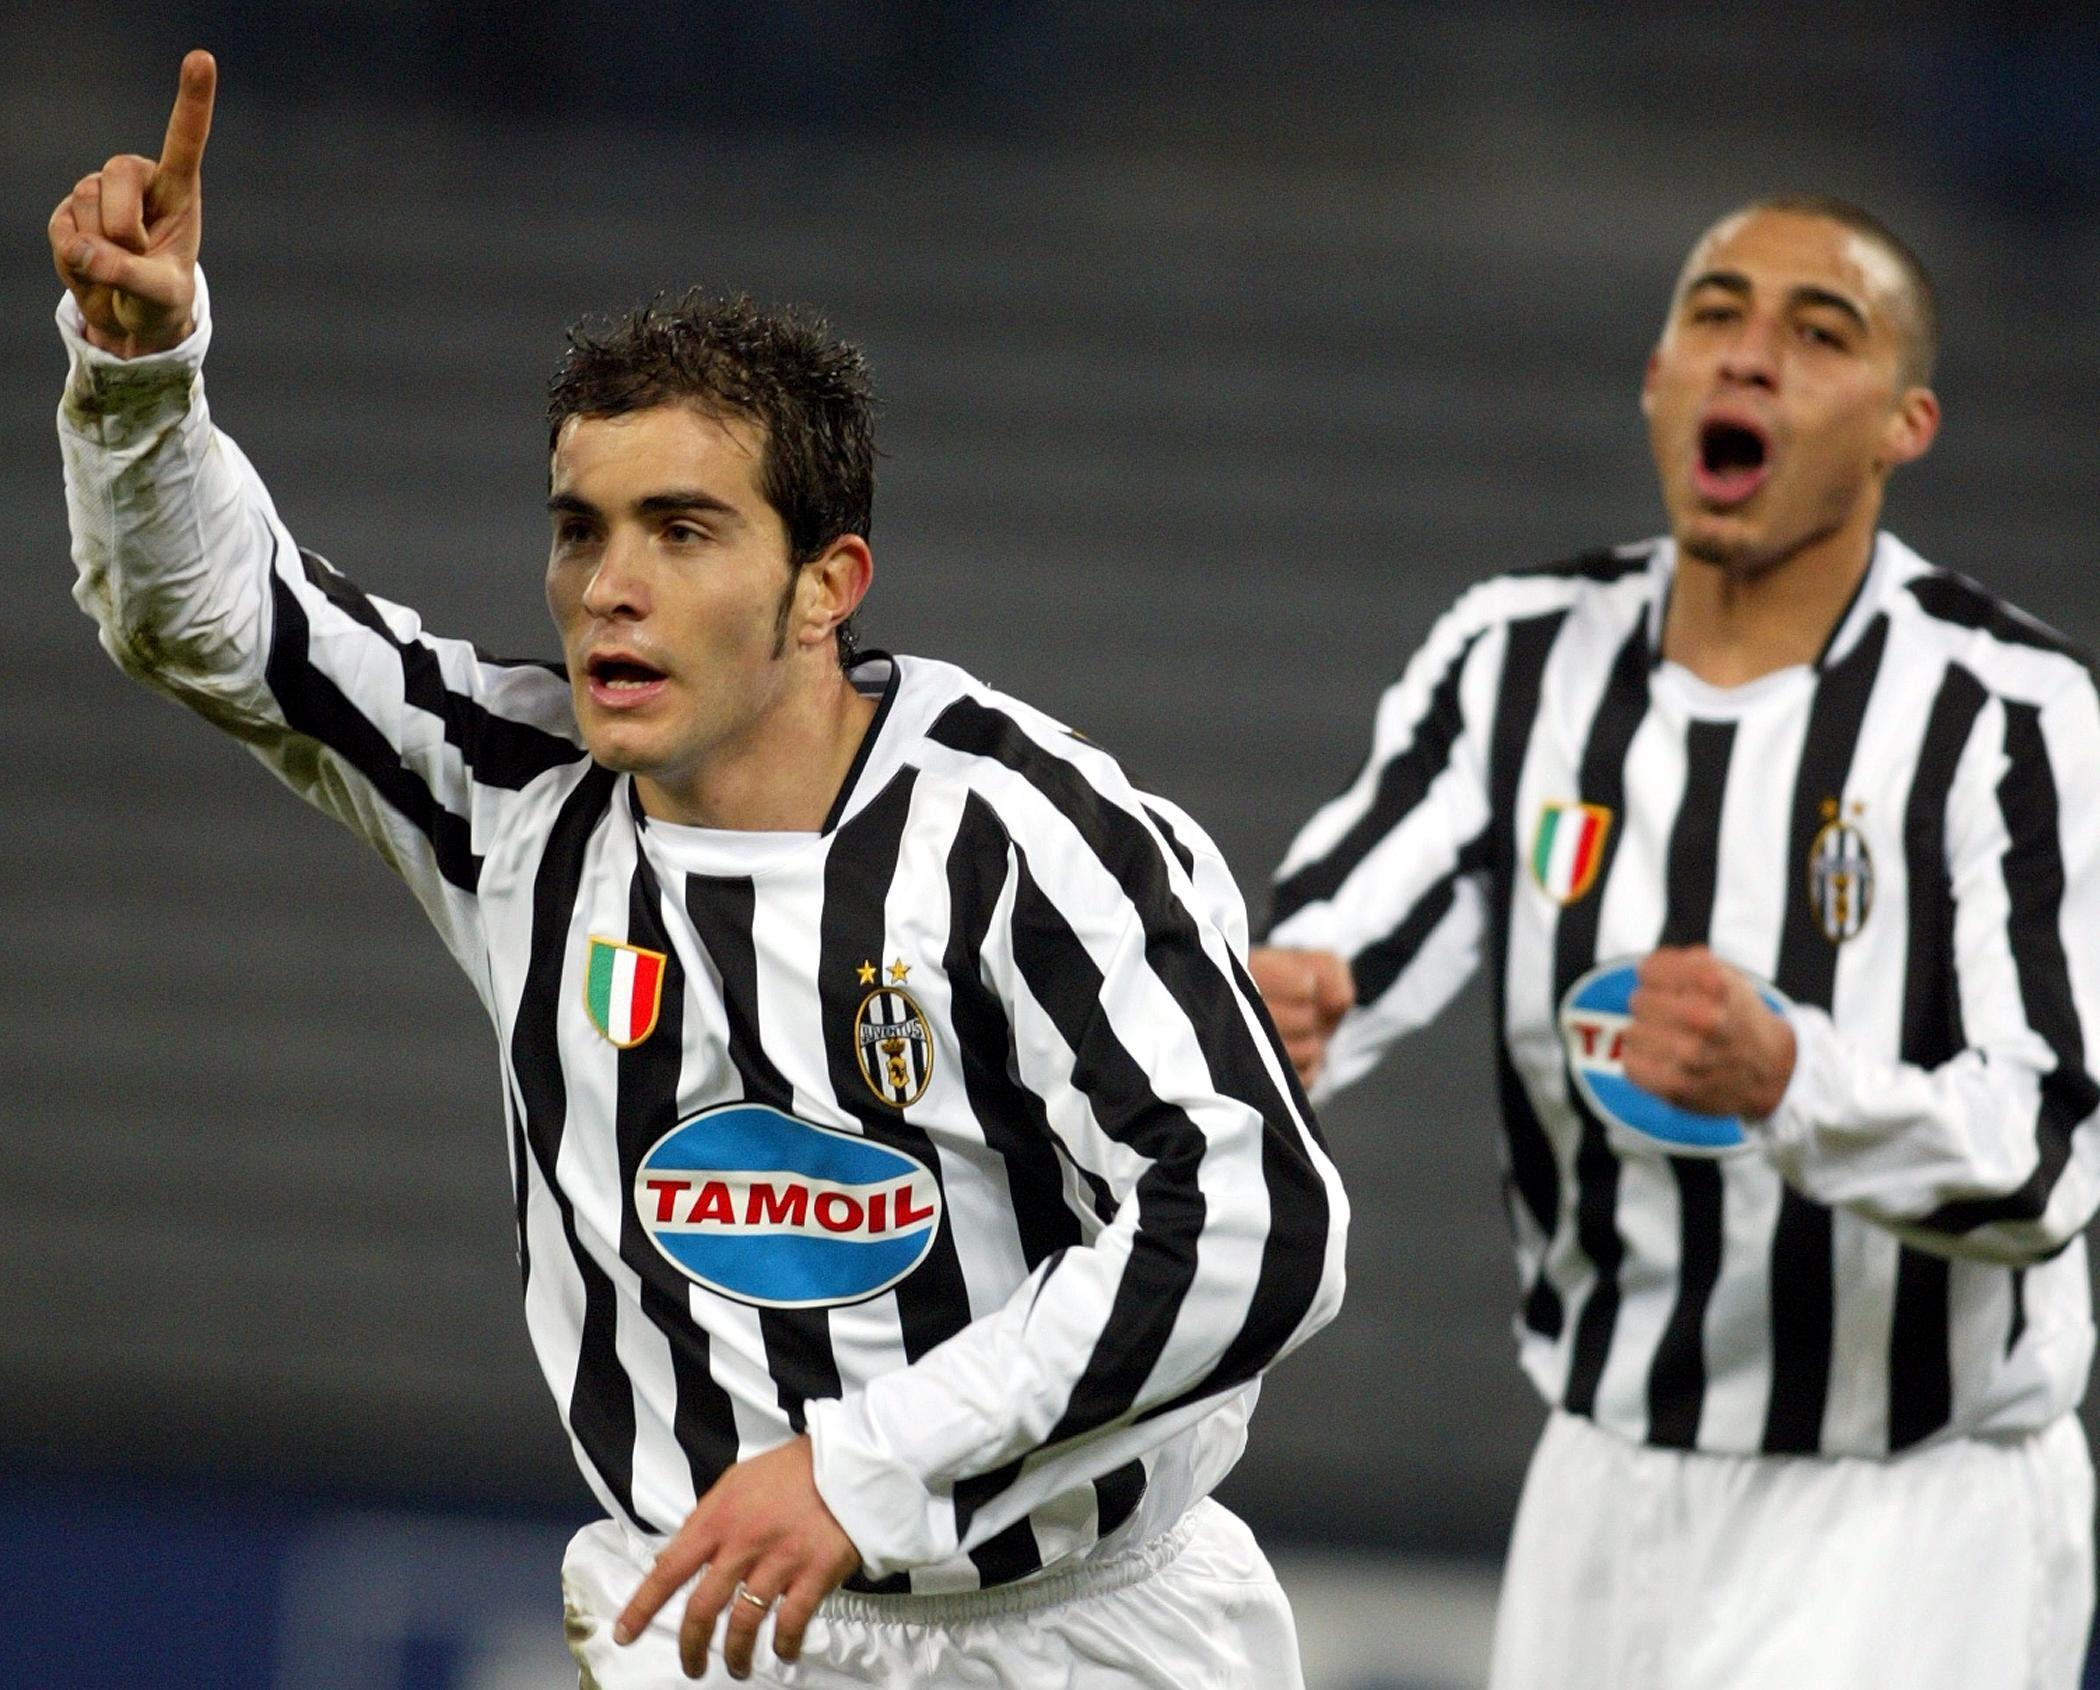 Lultimo Juventus Olympiakos Che Goleada Dei Bianconeri Nel 2003 Video